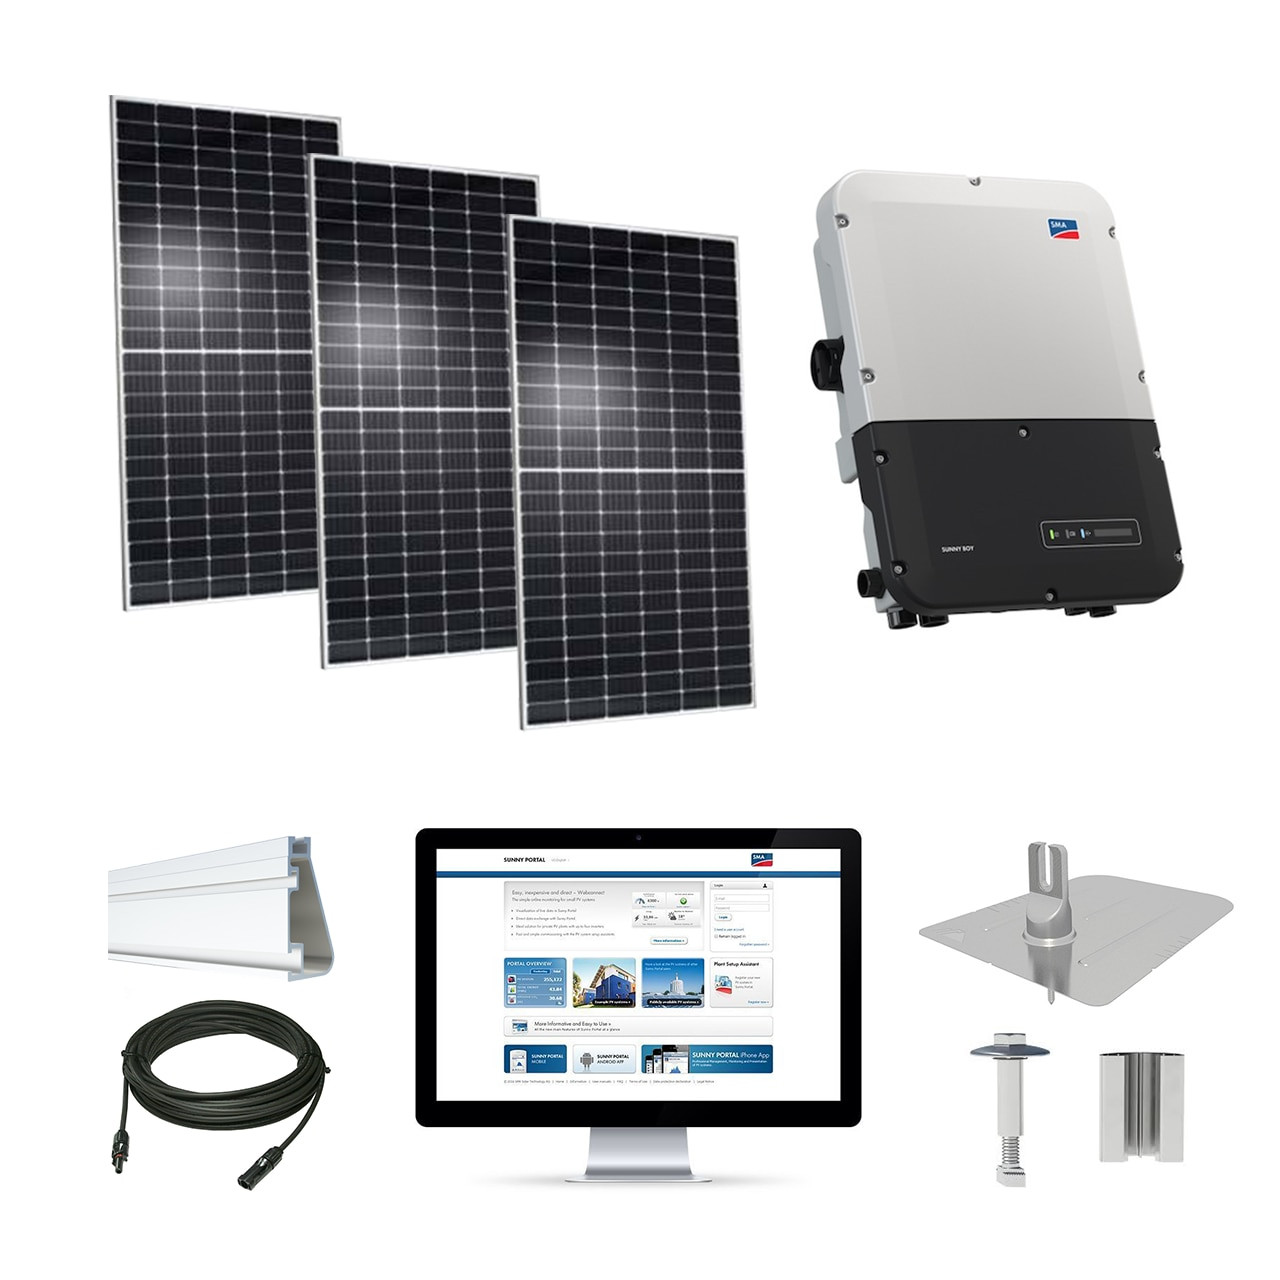 10kw Solar Kit Axitec 400 Xl Sma Sunny Boy Inverter Ac 400mh 144s